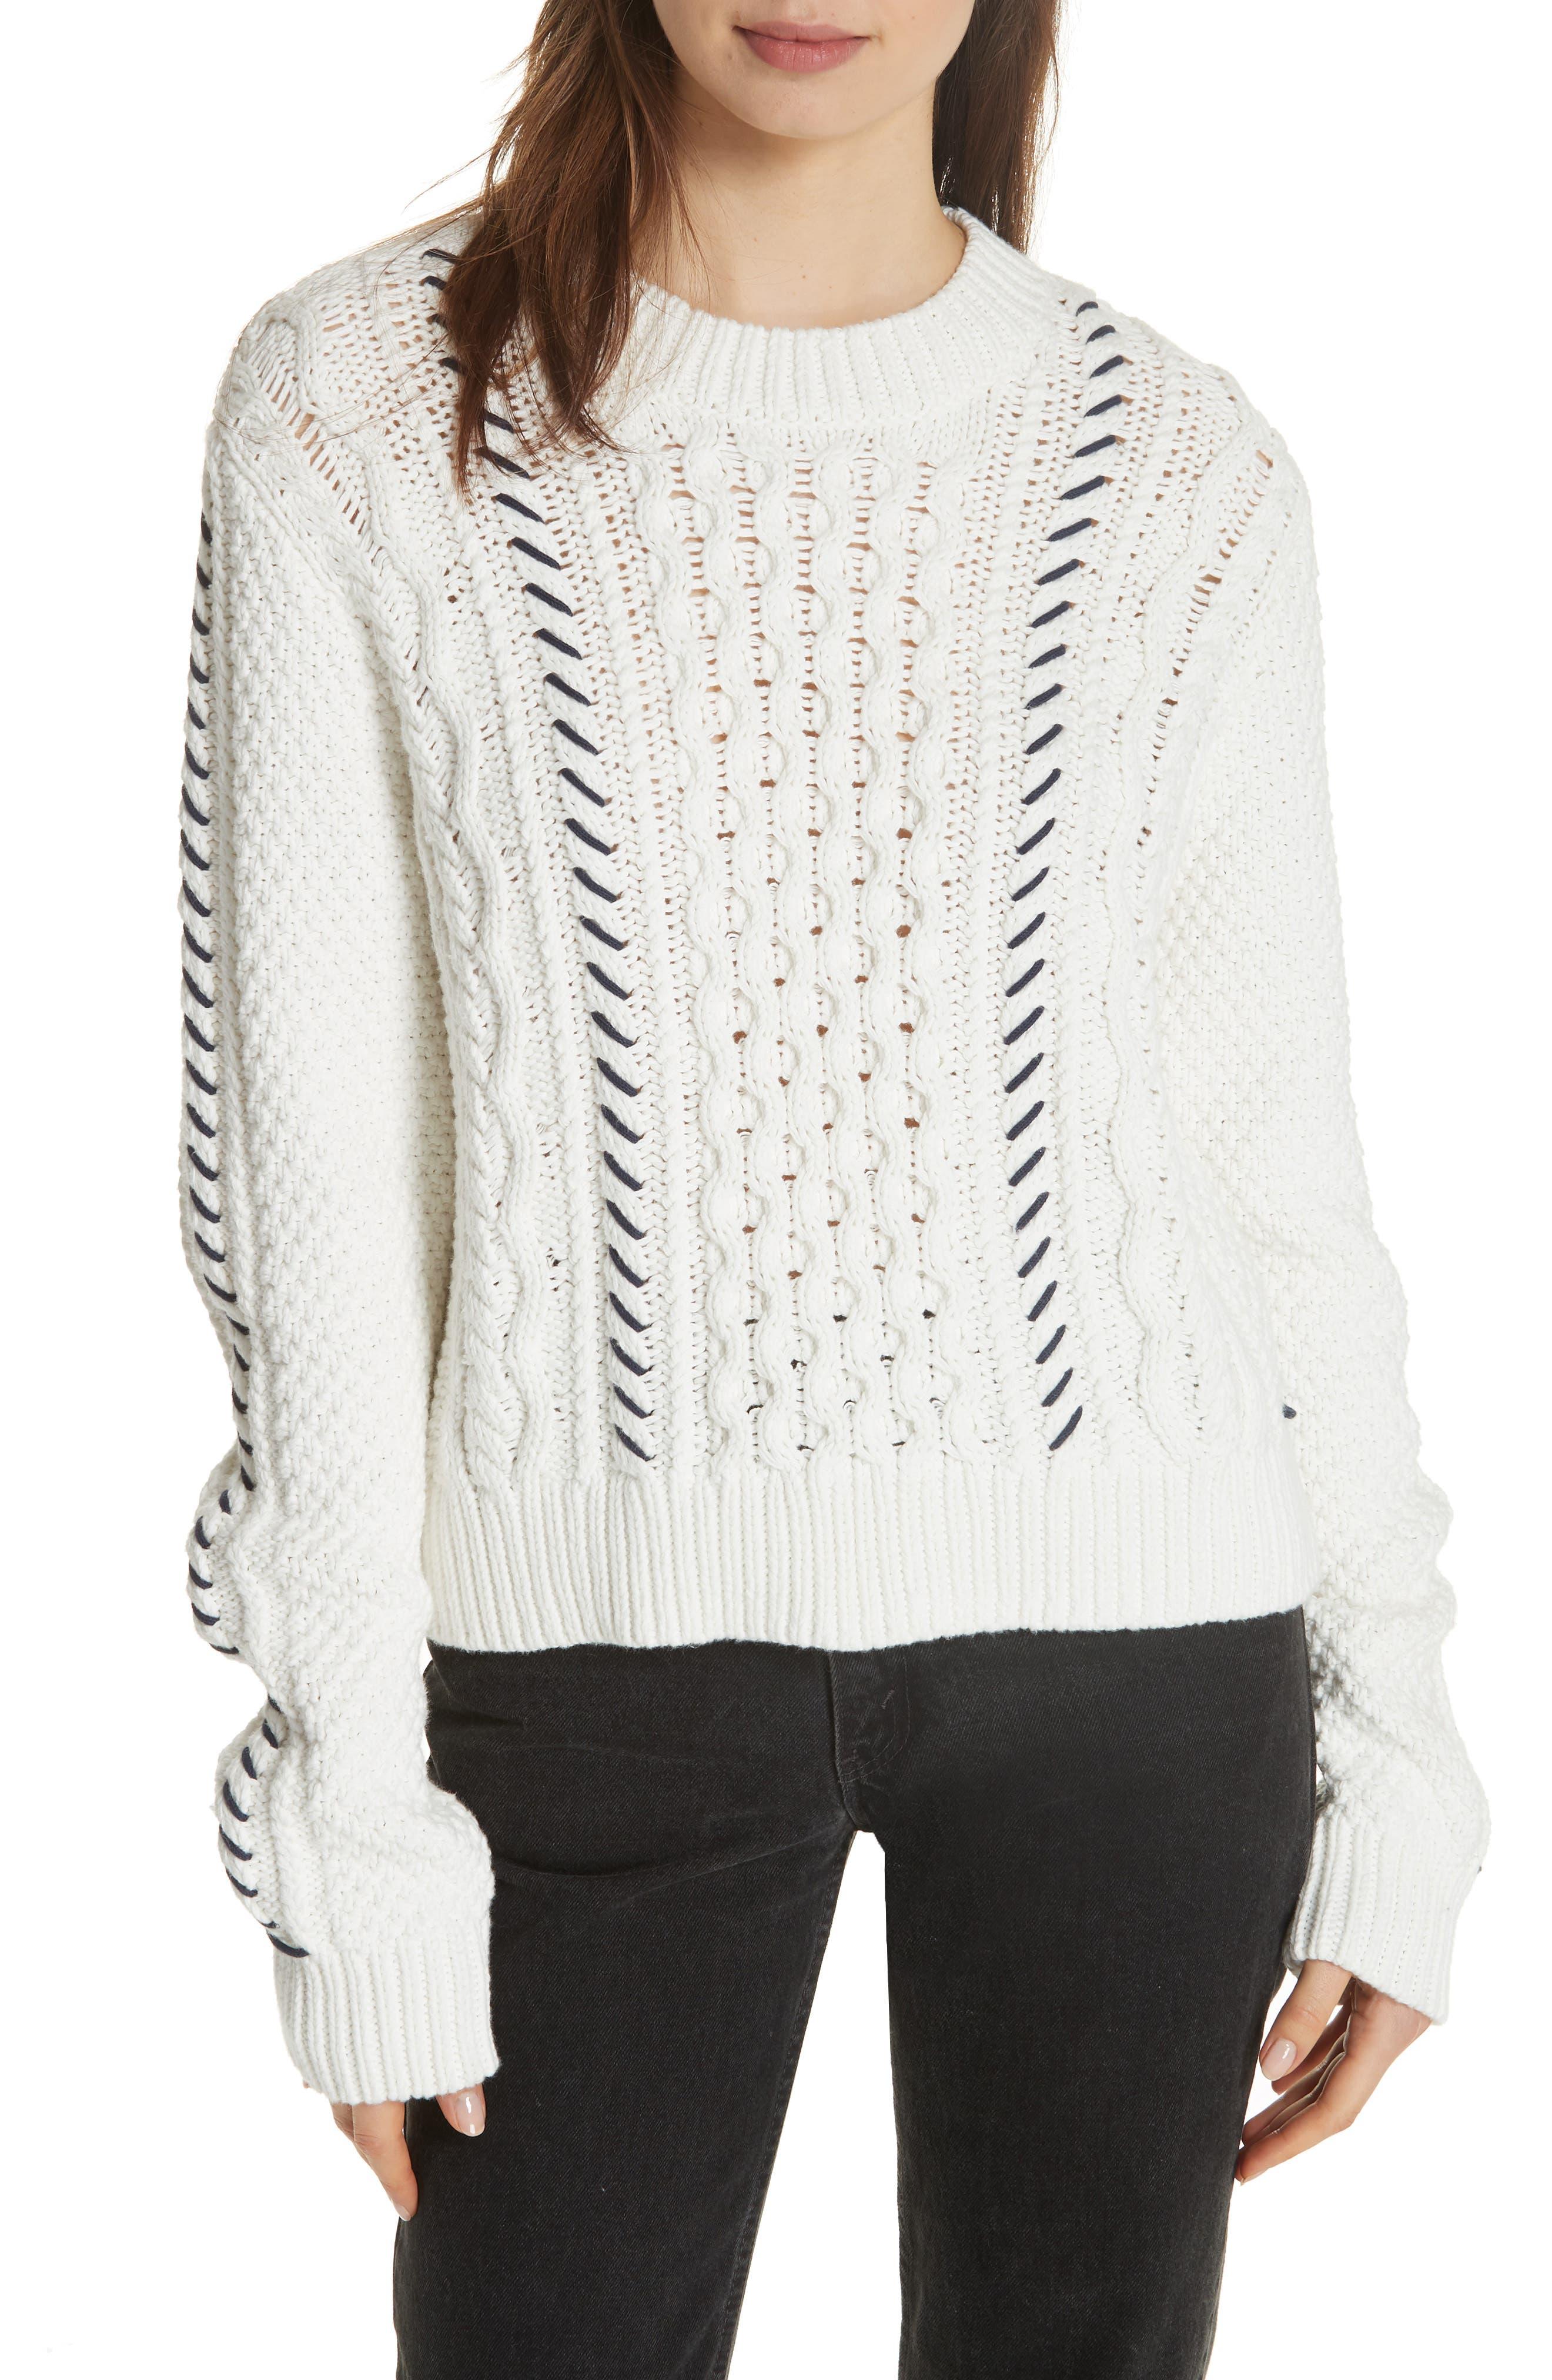 Cotton Fisherman Sweater,                             Main thumbnail 1, color,                             WHITE NAVY